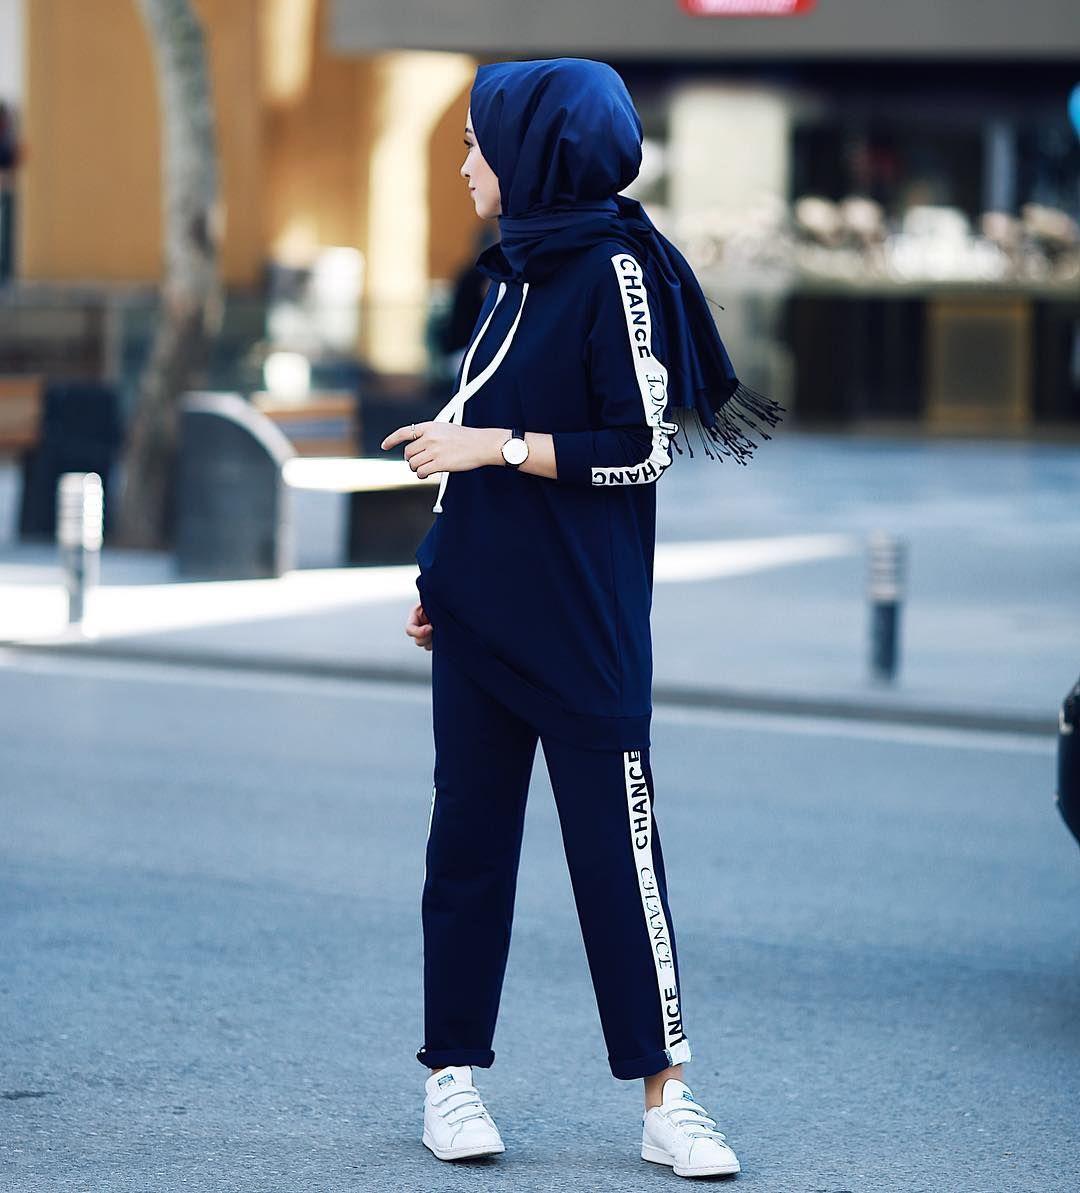 16 6k Likes 90 Comments Rabia Sena Sever Senaseveer On Instagram Hasemasportswear Konforunun Yuzume Yansimis H Fashion Hijab Fashion Hijab Fashionista